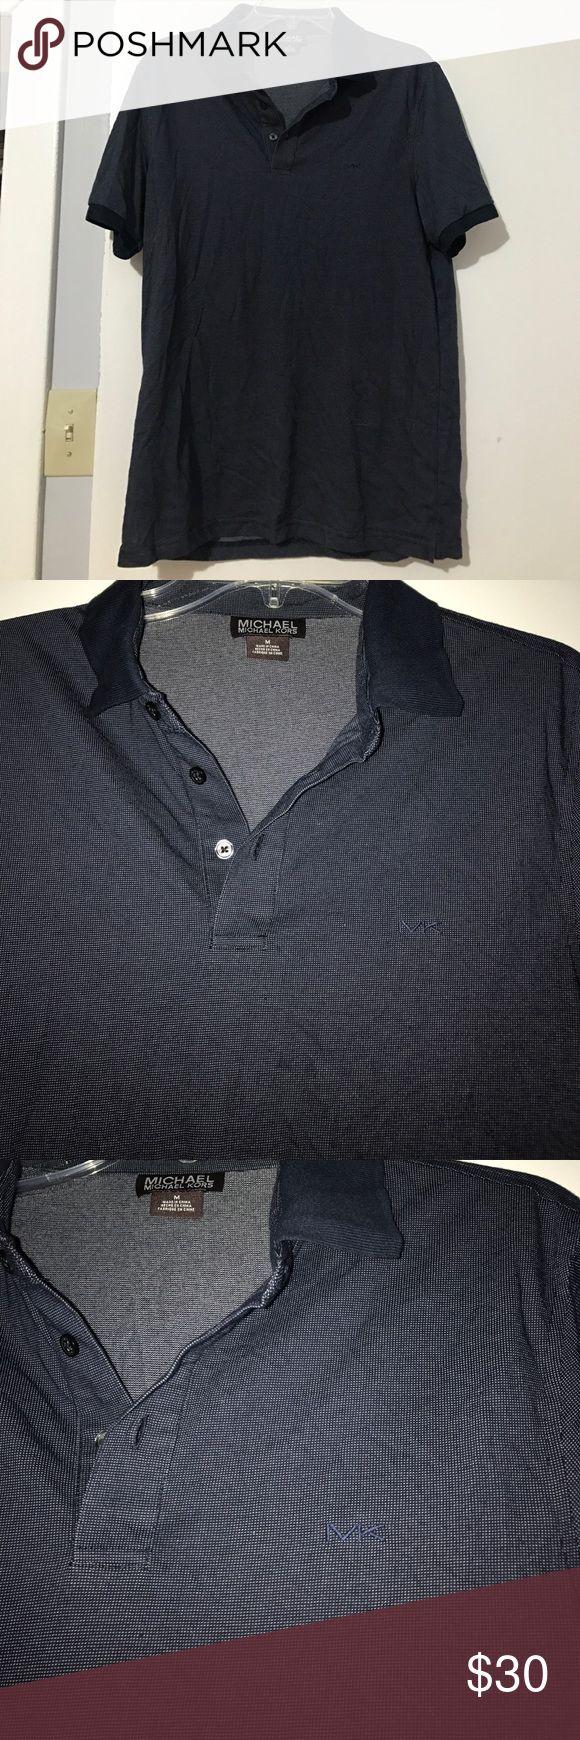 Michael Kors Men's shirt NWOT NO STAINS Michael Kors Shirts